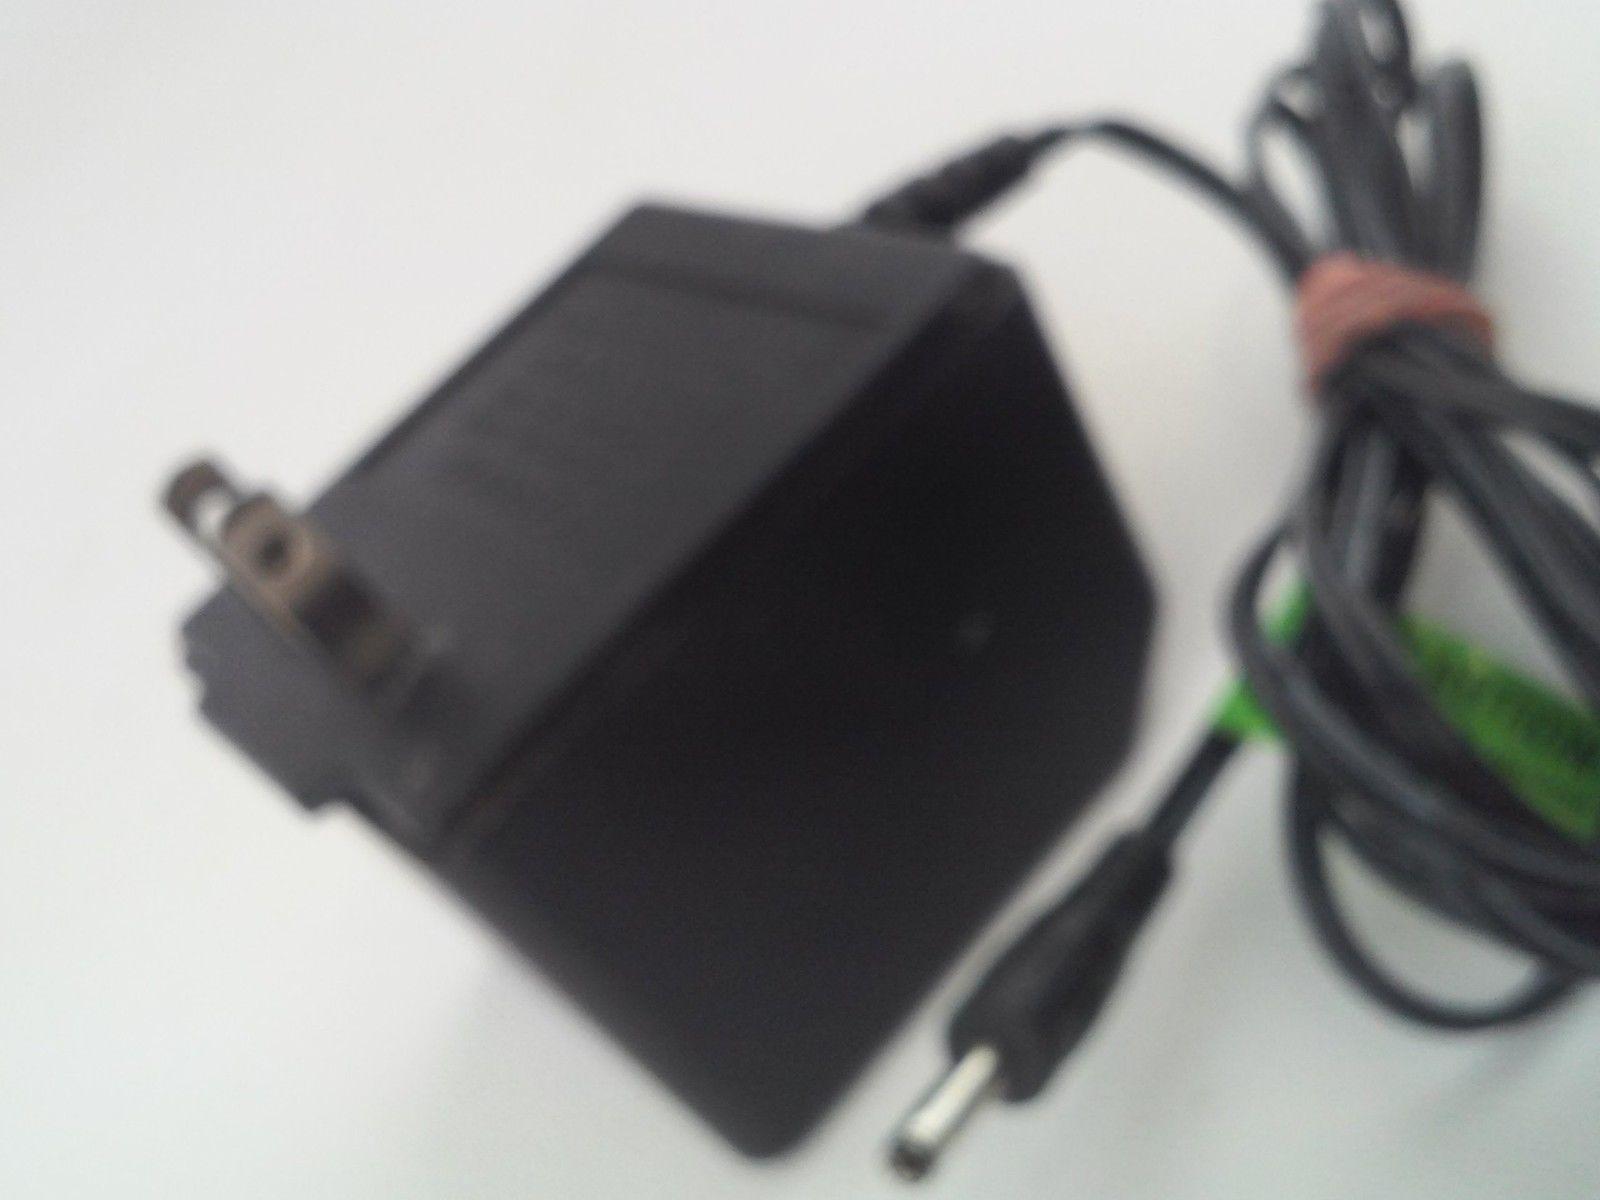 hight resolution of 15v ac adapter cord harman kardon 06941v speakers dell computer pc power plug for sale item 1694139